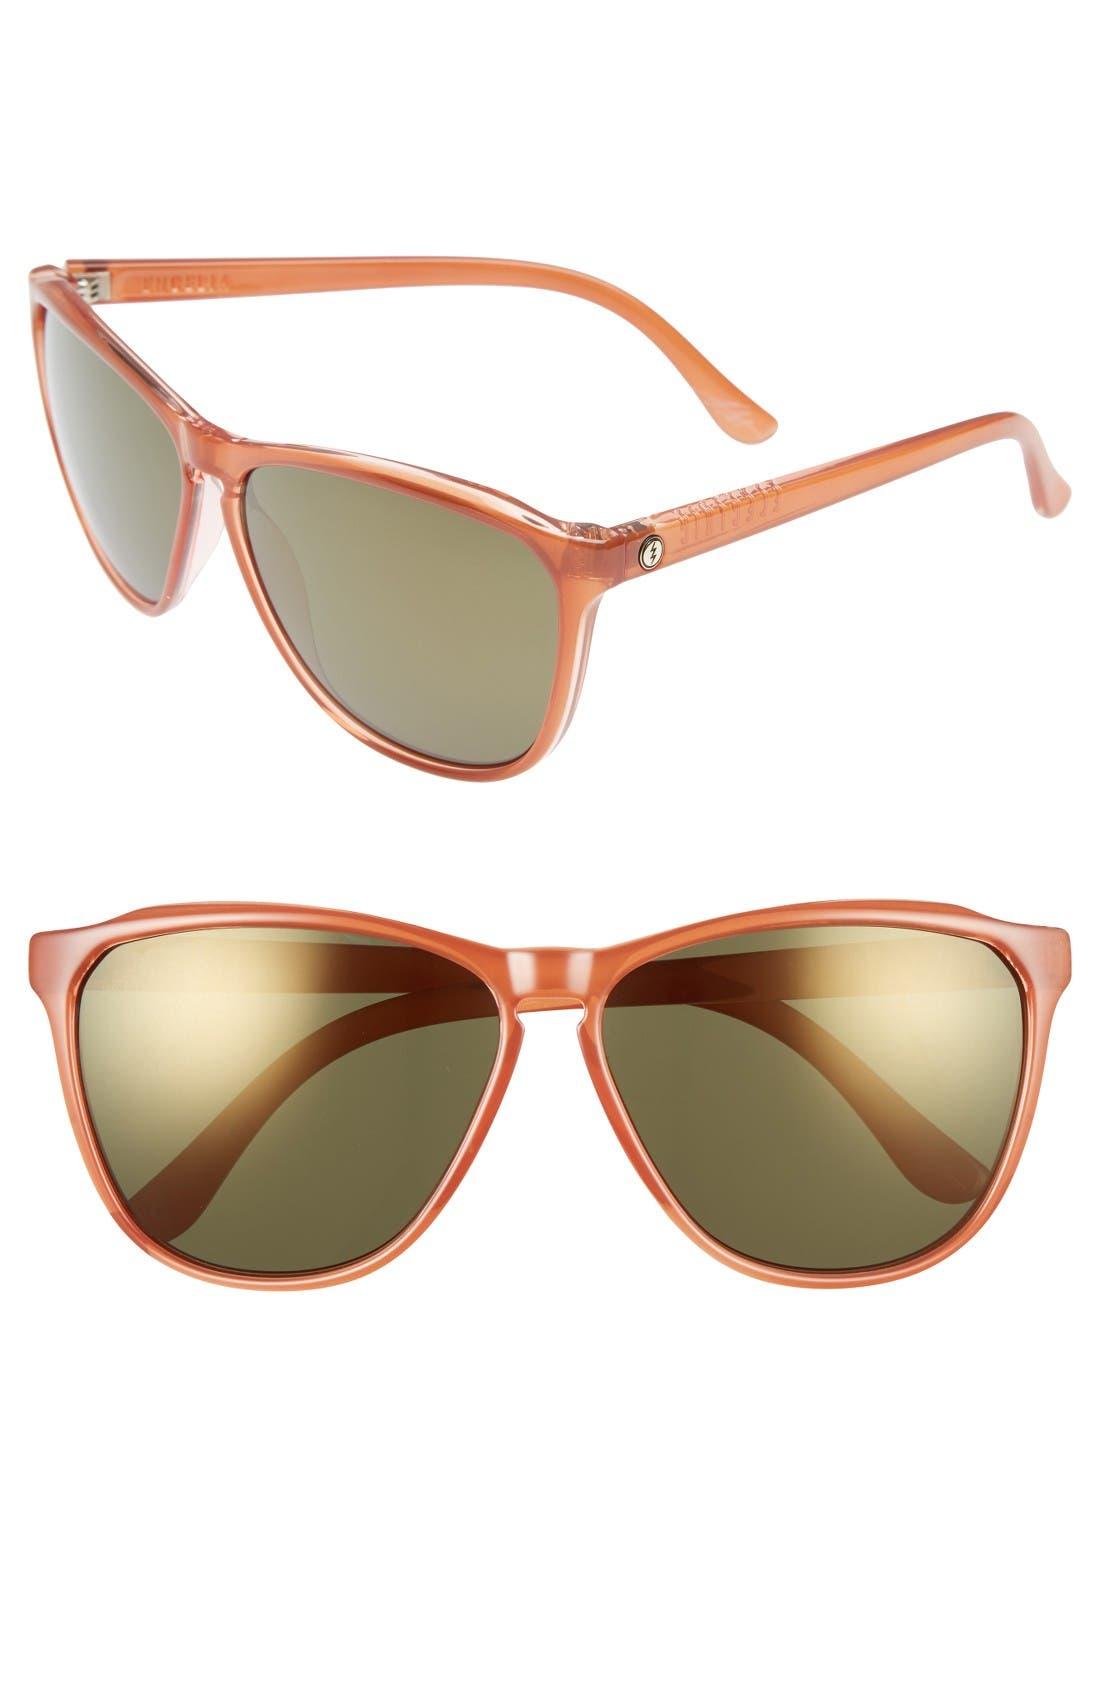 Main Image - ELECTRIC 'Encelia' 61mm Retro Sunglasses